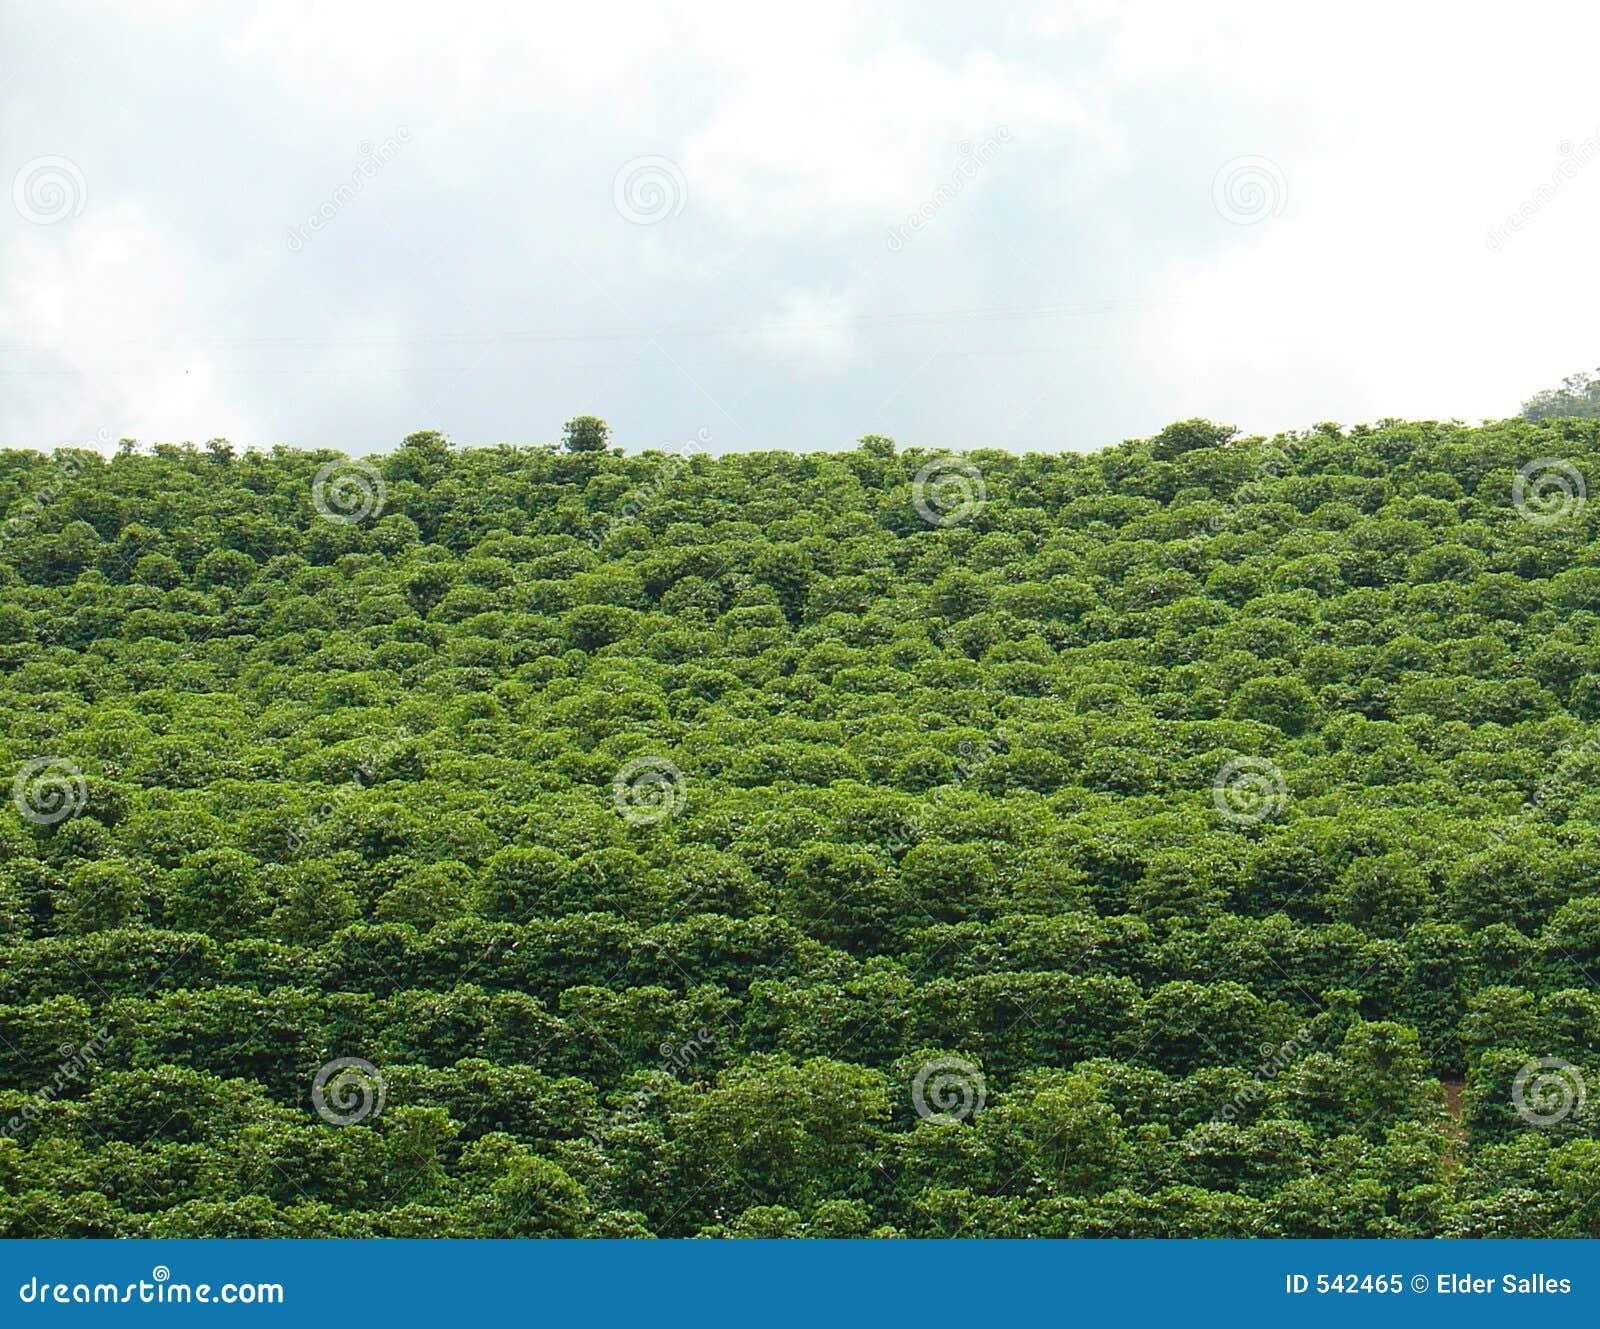 Download 咖啡种植园 库存图片. 图片 包括有 制动手, 文化, 自然, 黑暗, 农田, 咖啡, 问题的, 前面, 农场 - 542465